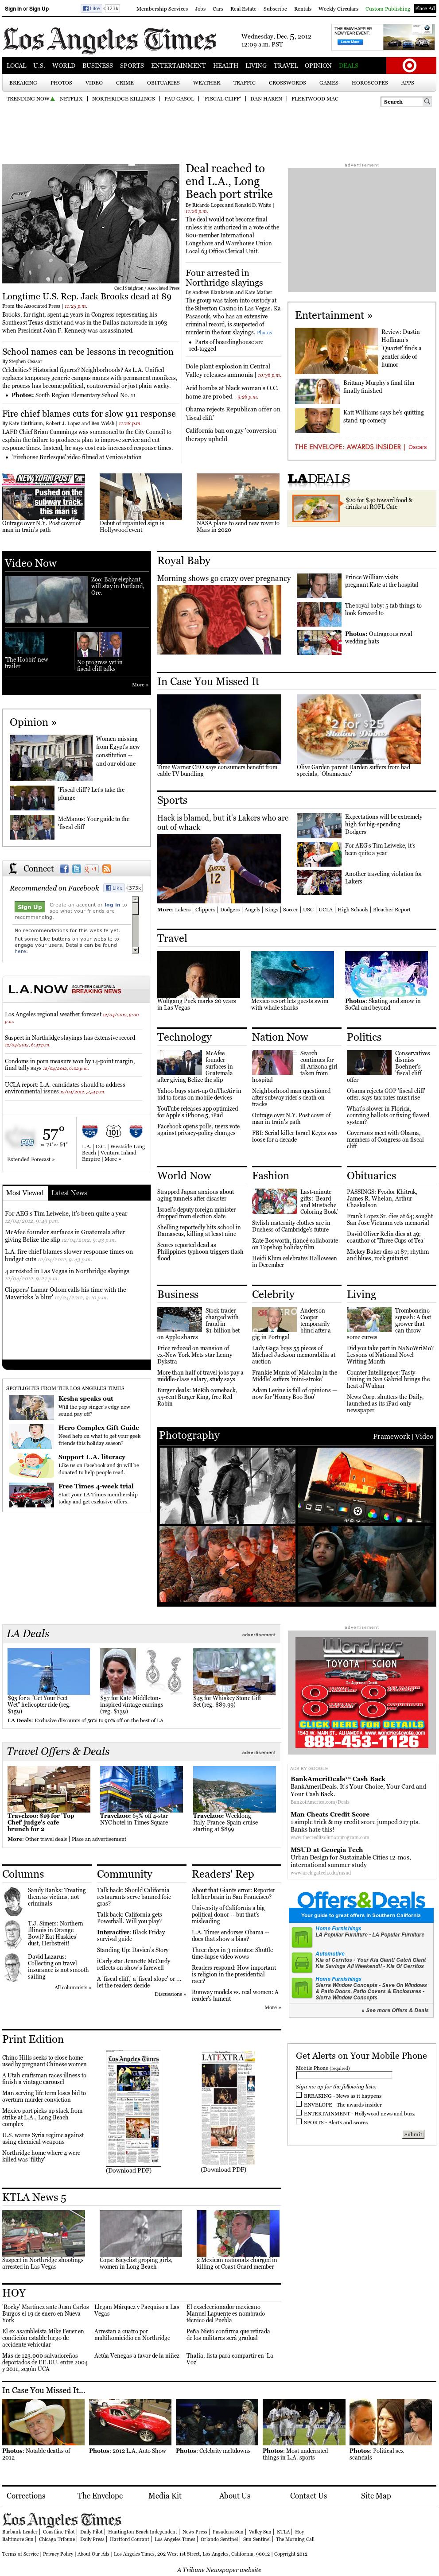 Los Angeles Times at Wednesday Dec. 5, 2012, 8:17 a.m. UTC